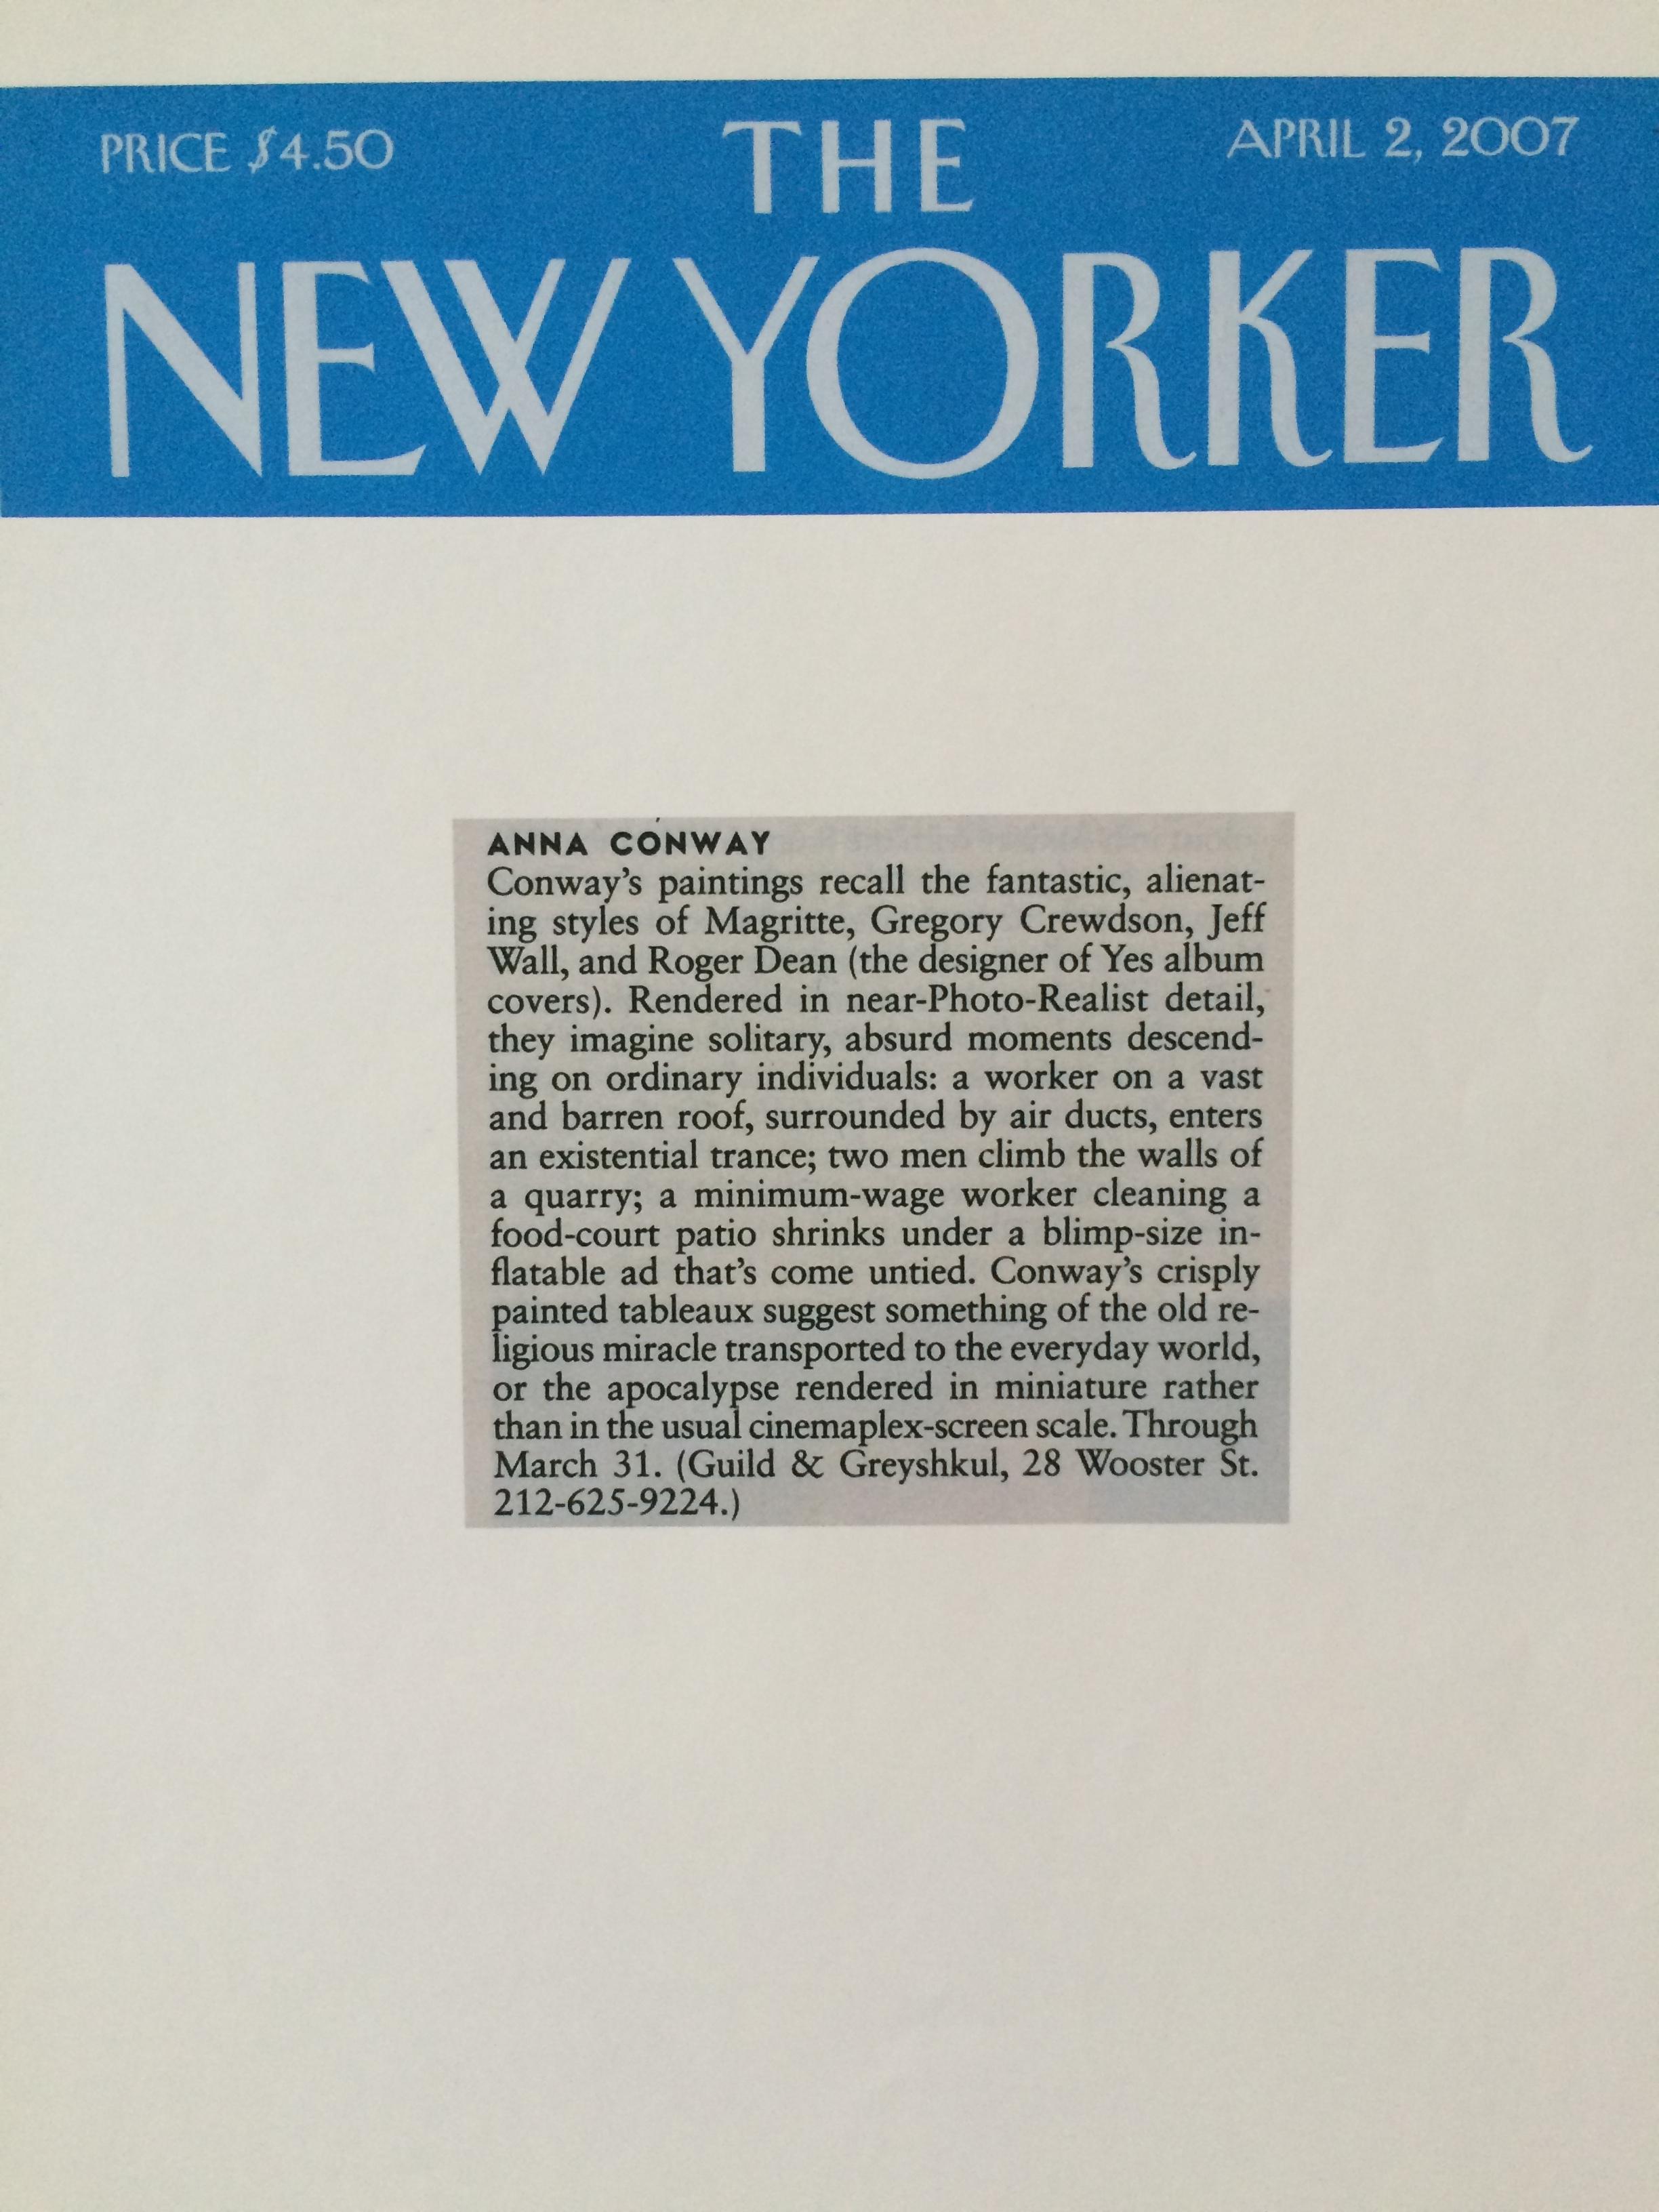 New Yorker, 2007